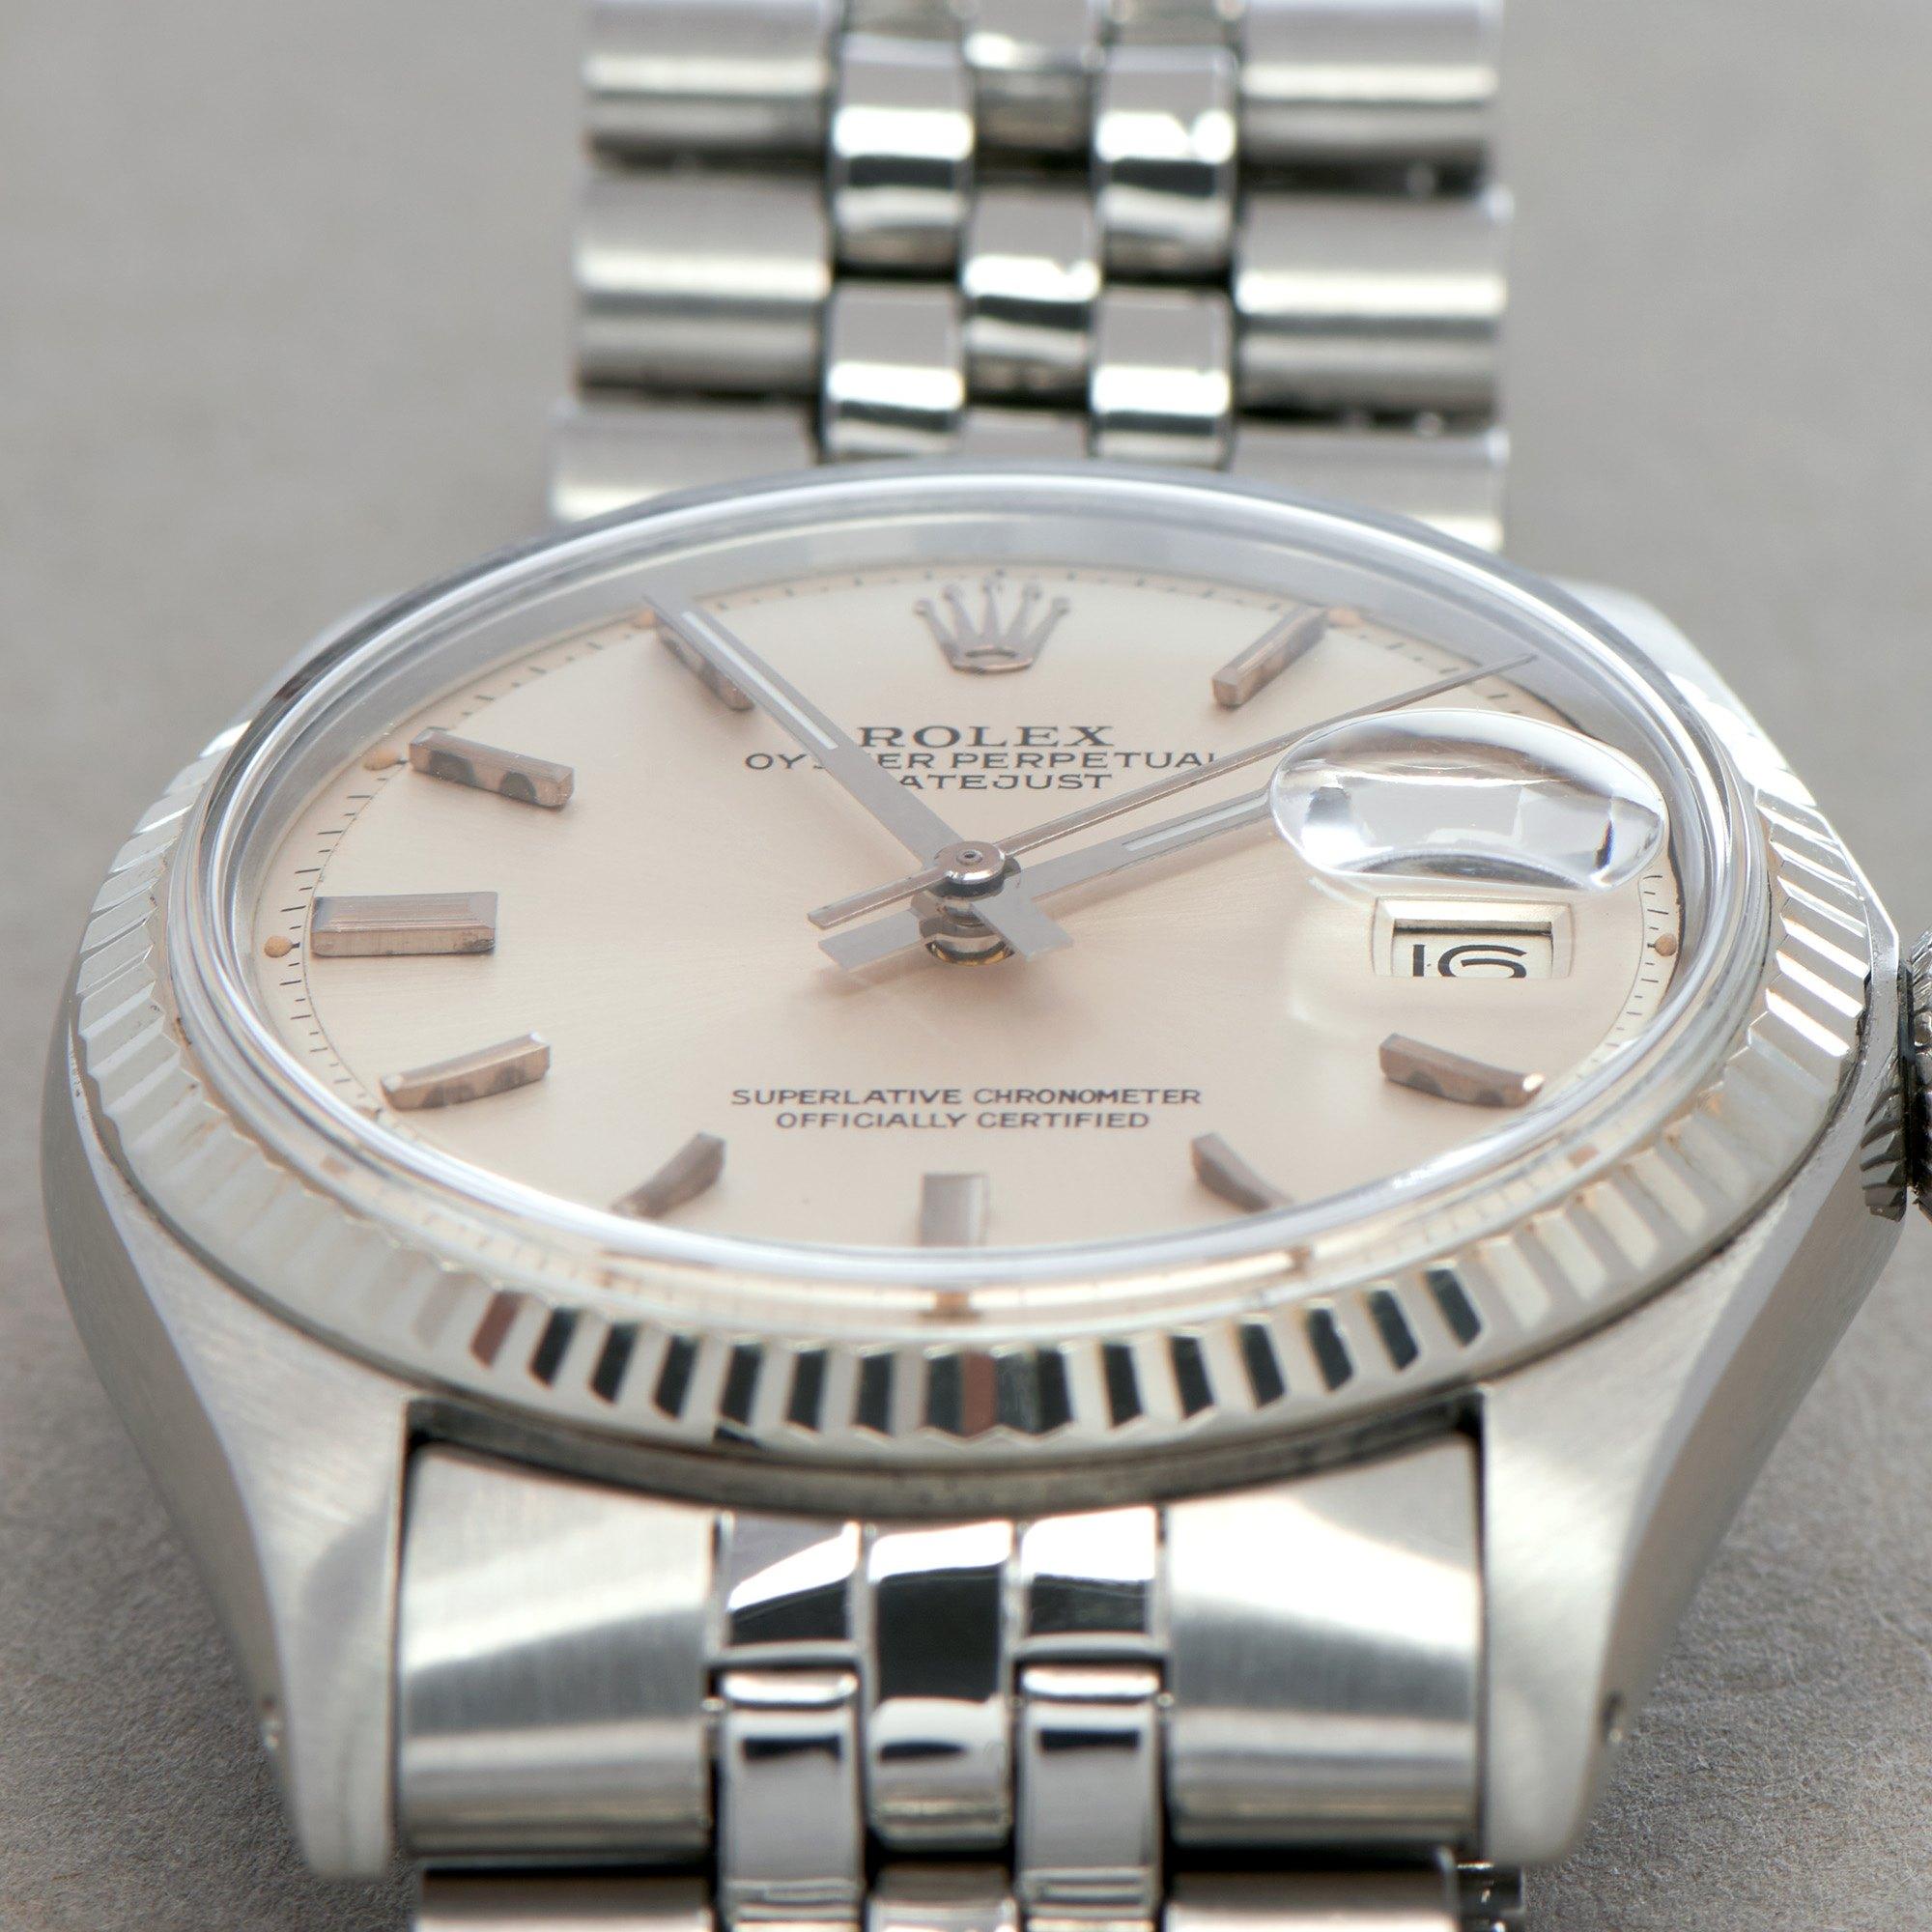 Rolex Datejust 36 18K White Gold & Stainless Steel 1601